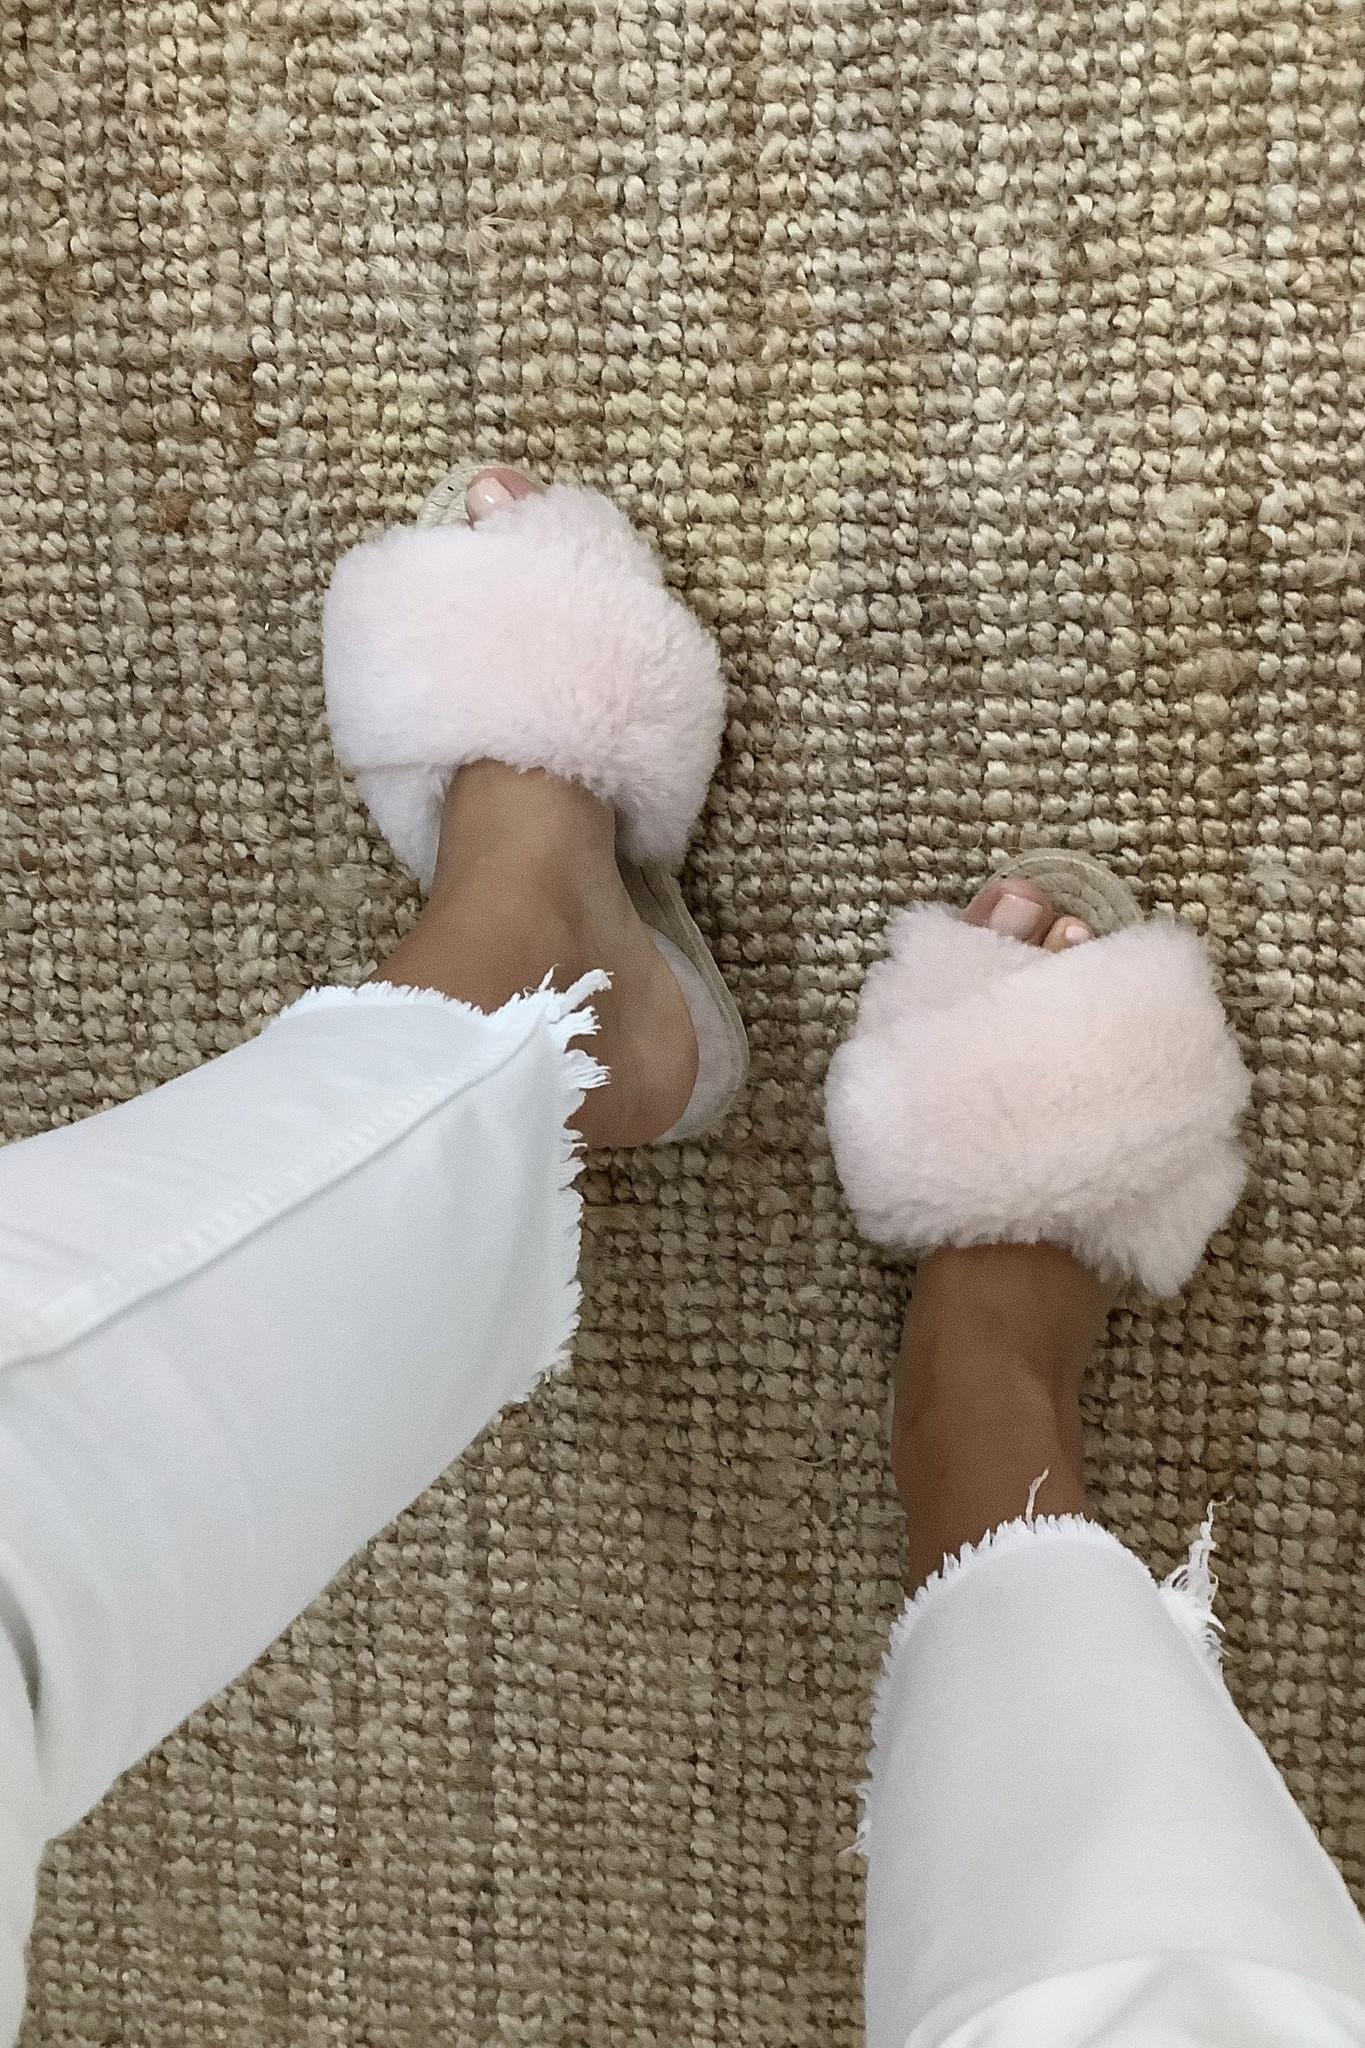 Lori Sheepskin Wool Slippers - Off White-7